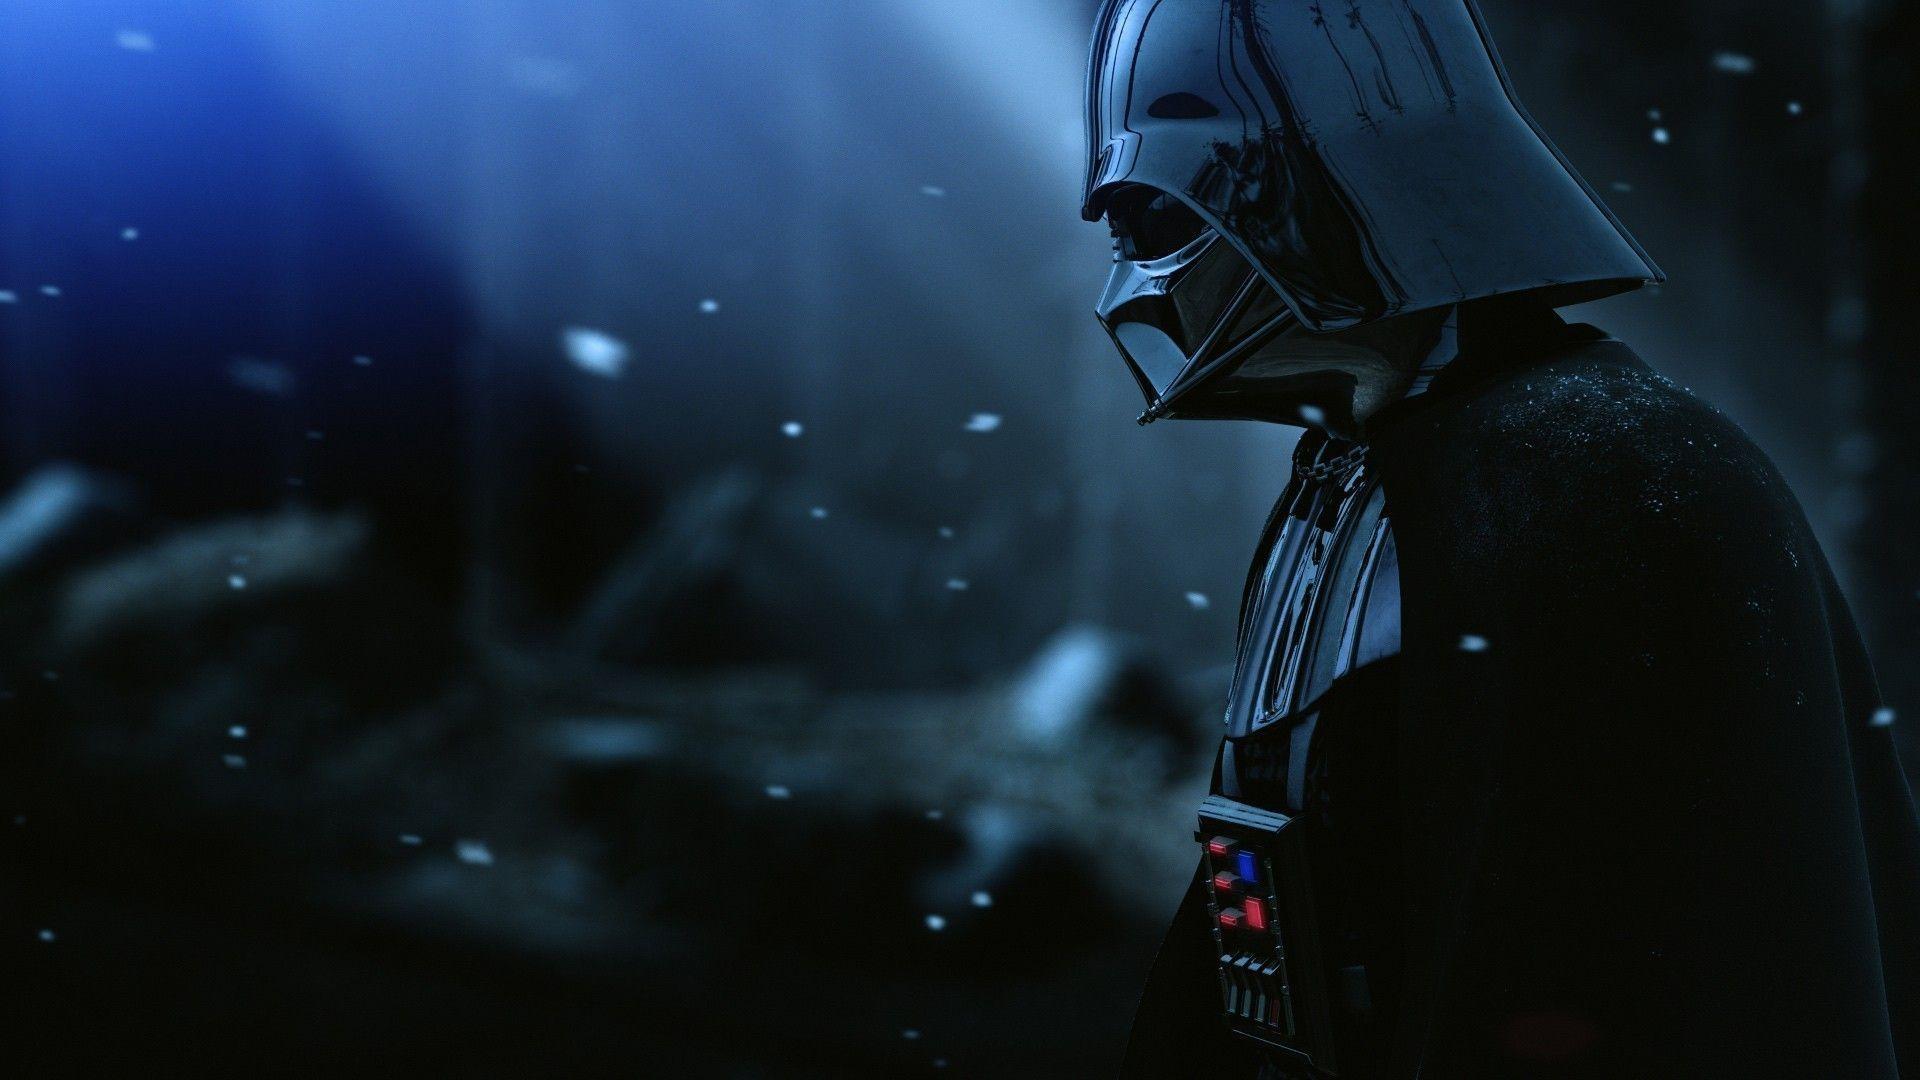 75 Darth Vader Wallpapers on WallpaperPlay 1920x1080